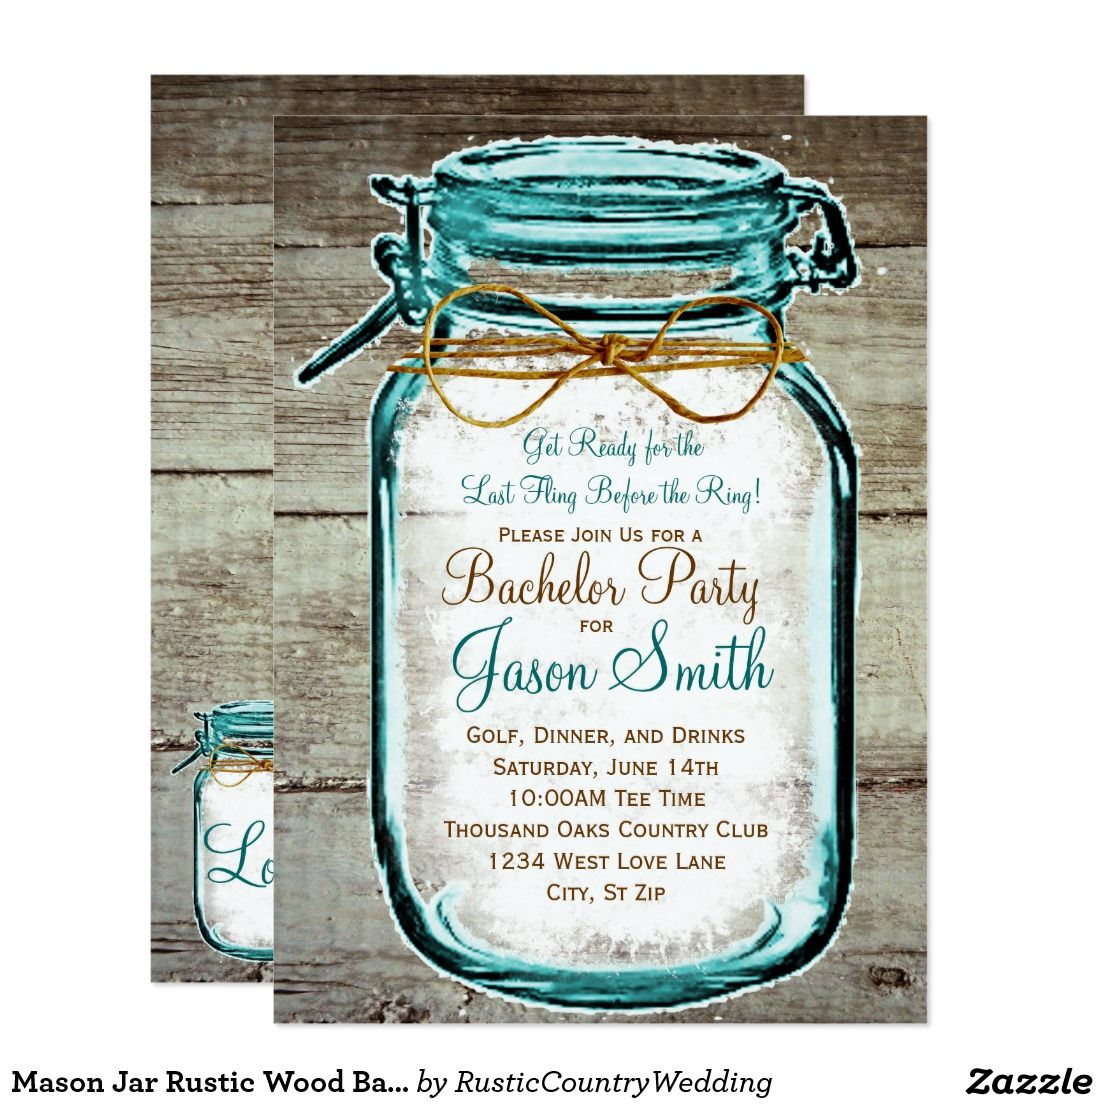 Mason Jar Rustic Wood Bachelor Party Invitations